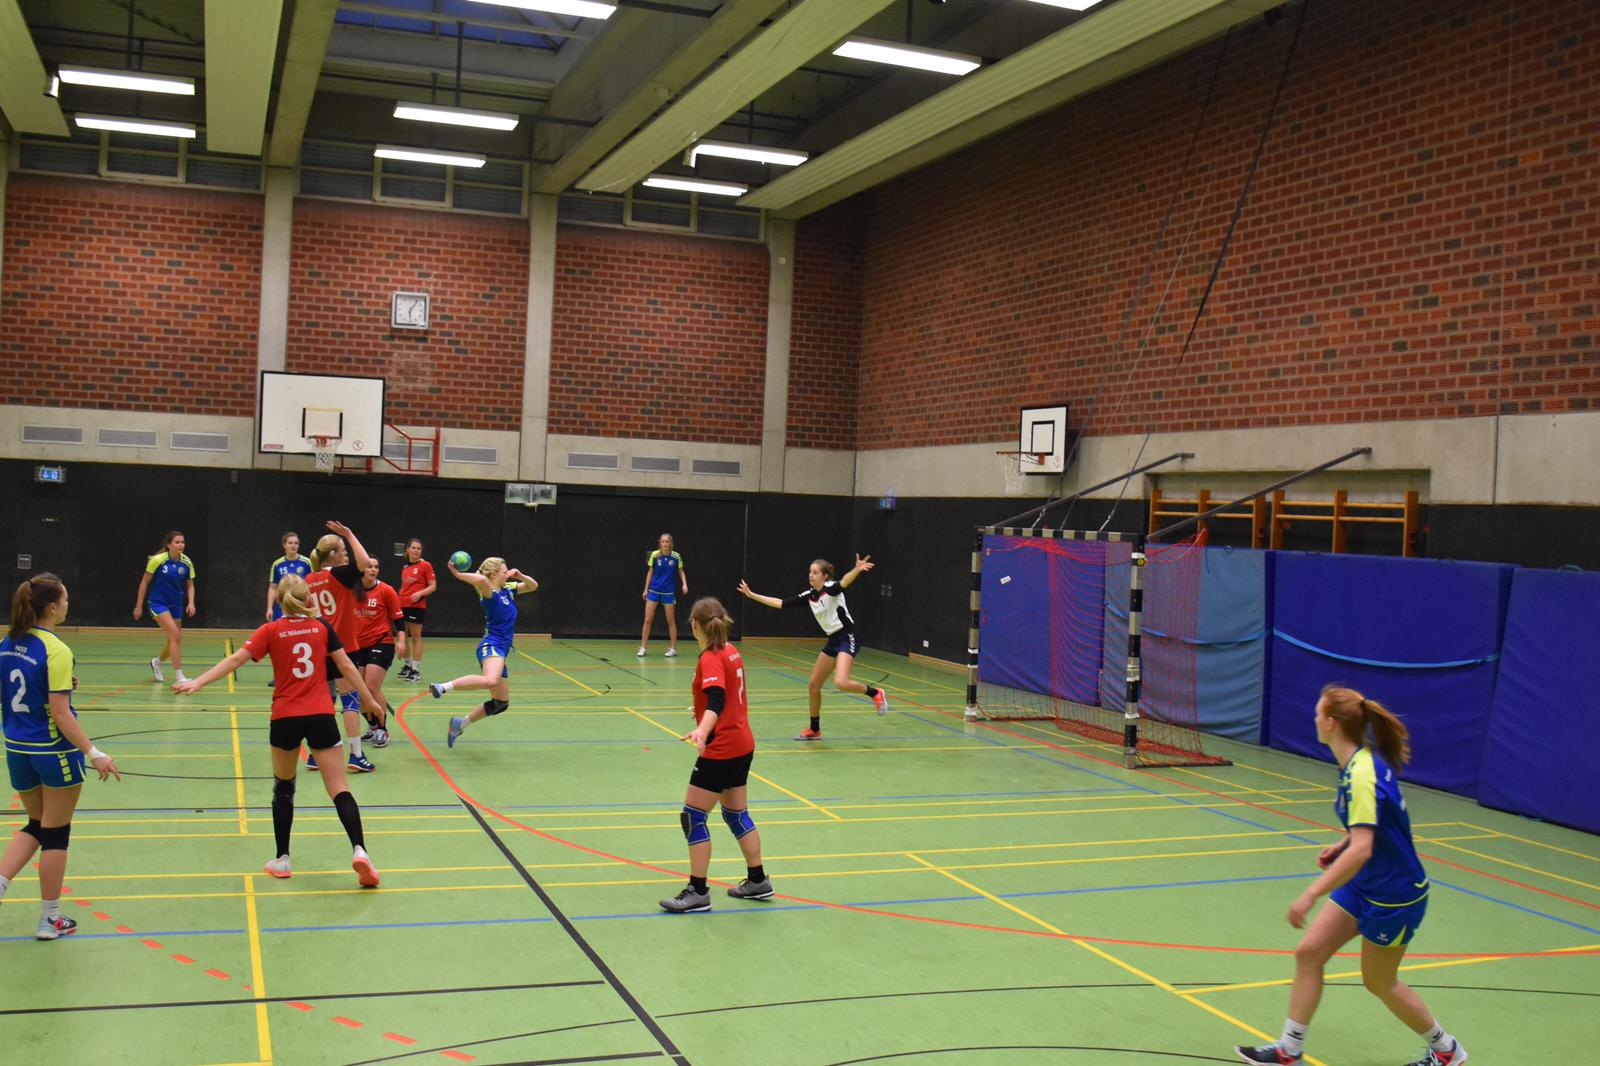 Damen HSG Gremmendorf Angelmodde gegen Münster 08